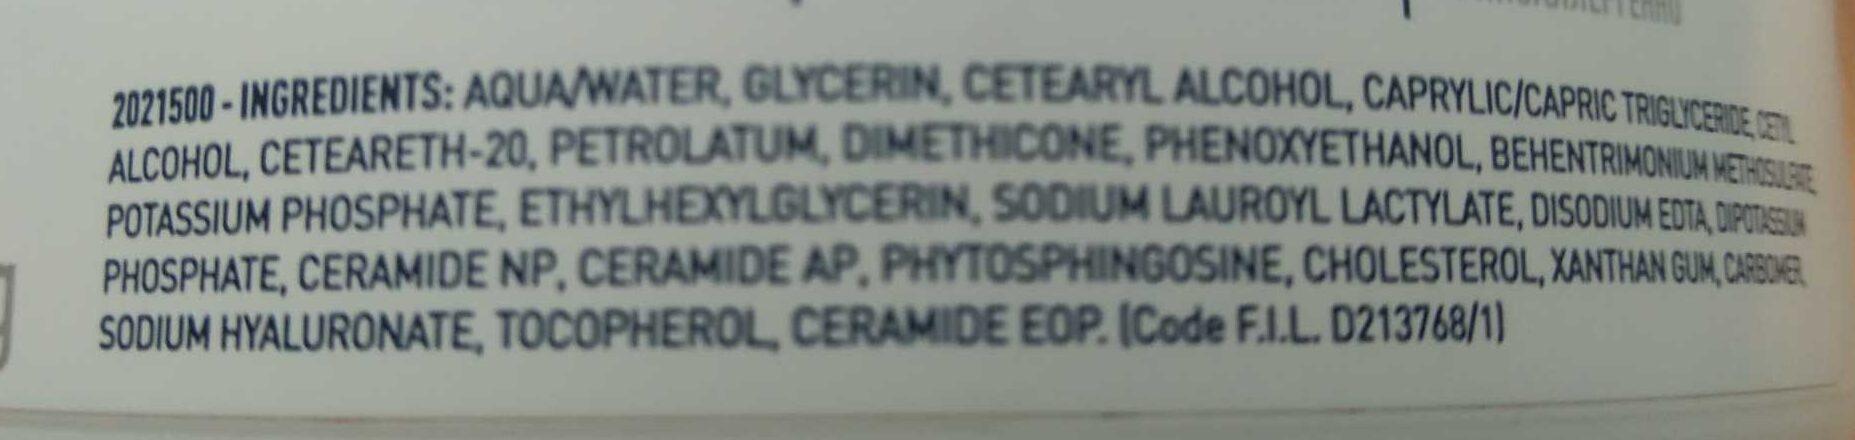 Crema Idratante - Ingredients